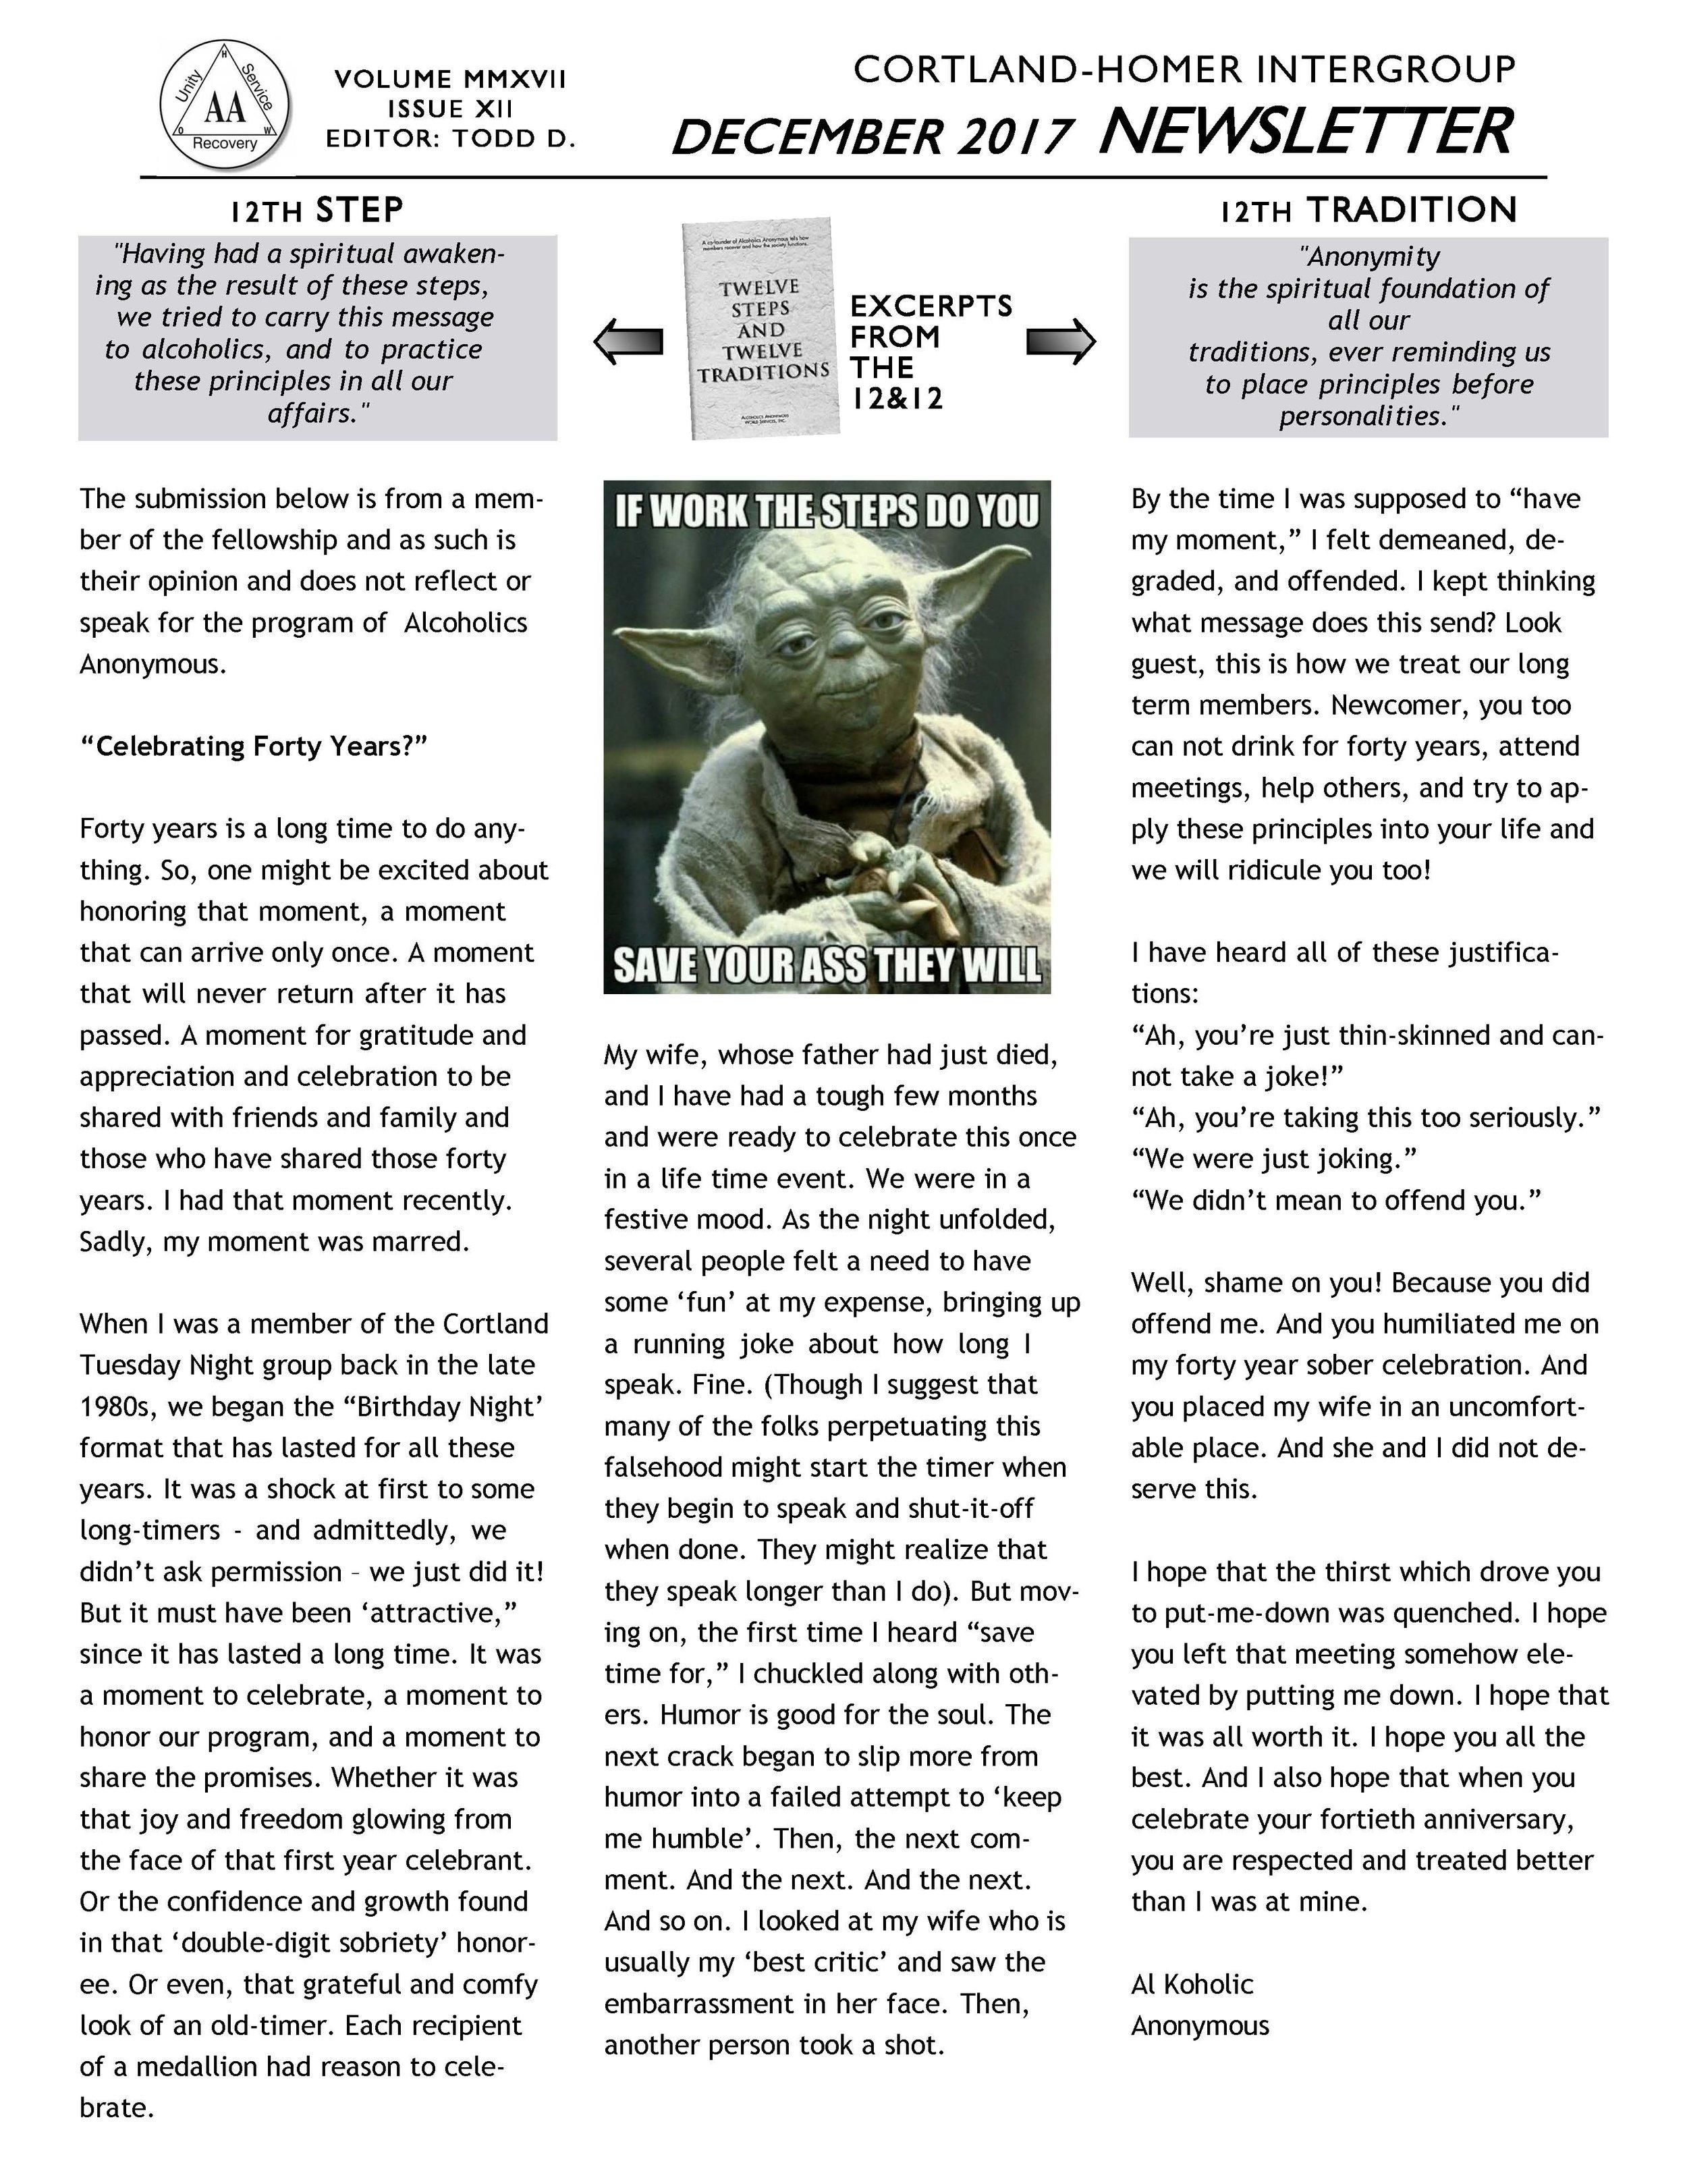 December Newsletter 2017_Page_1.jpg